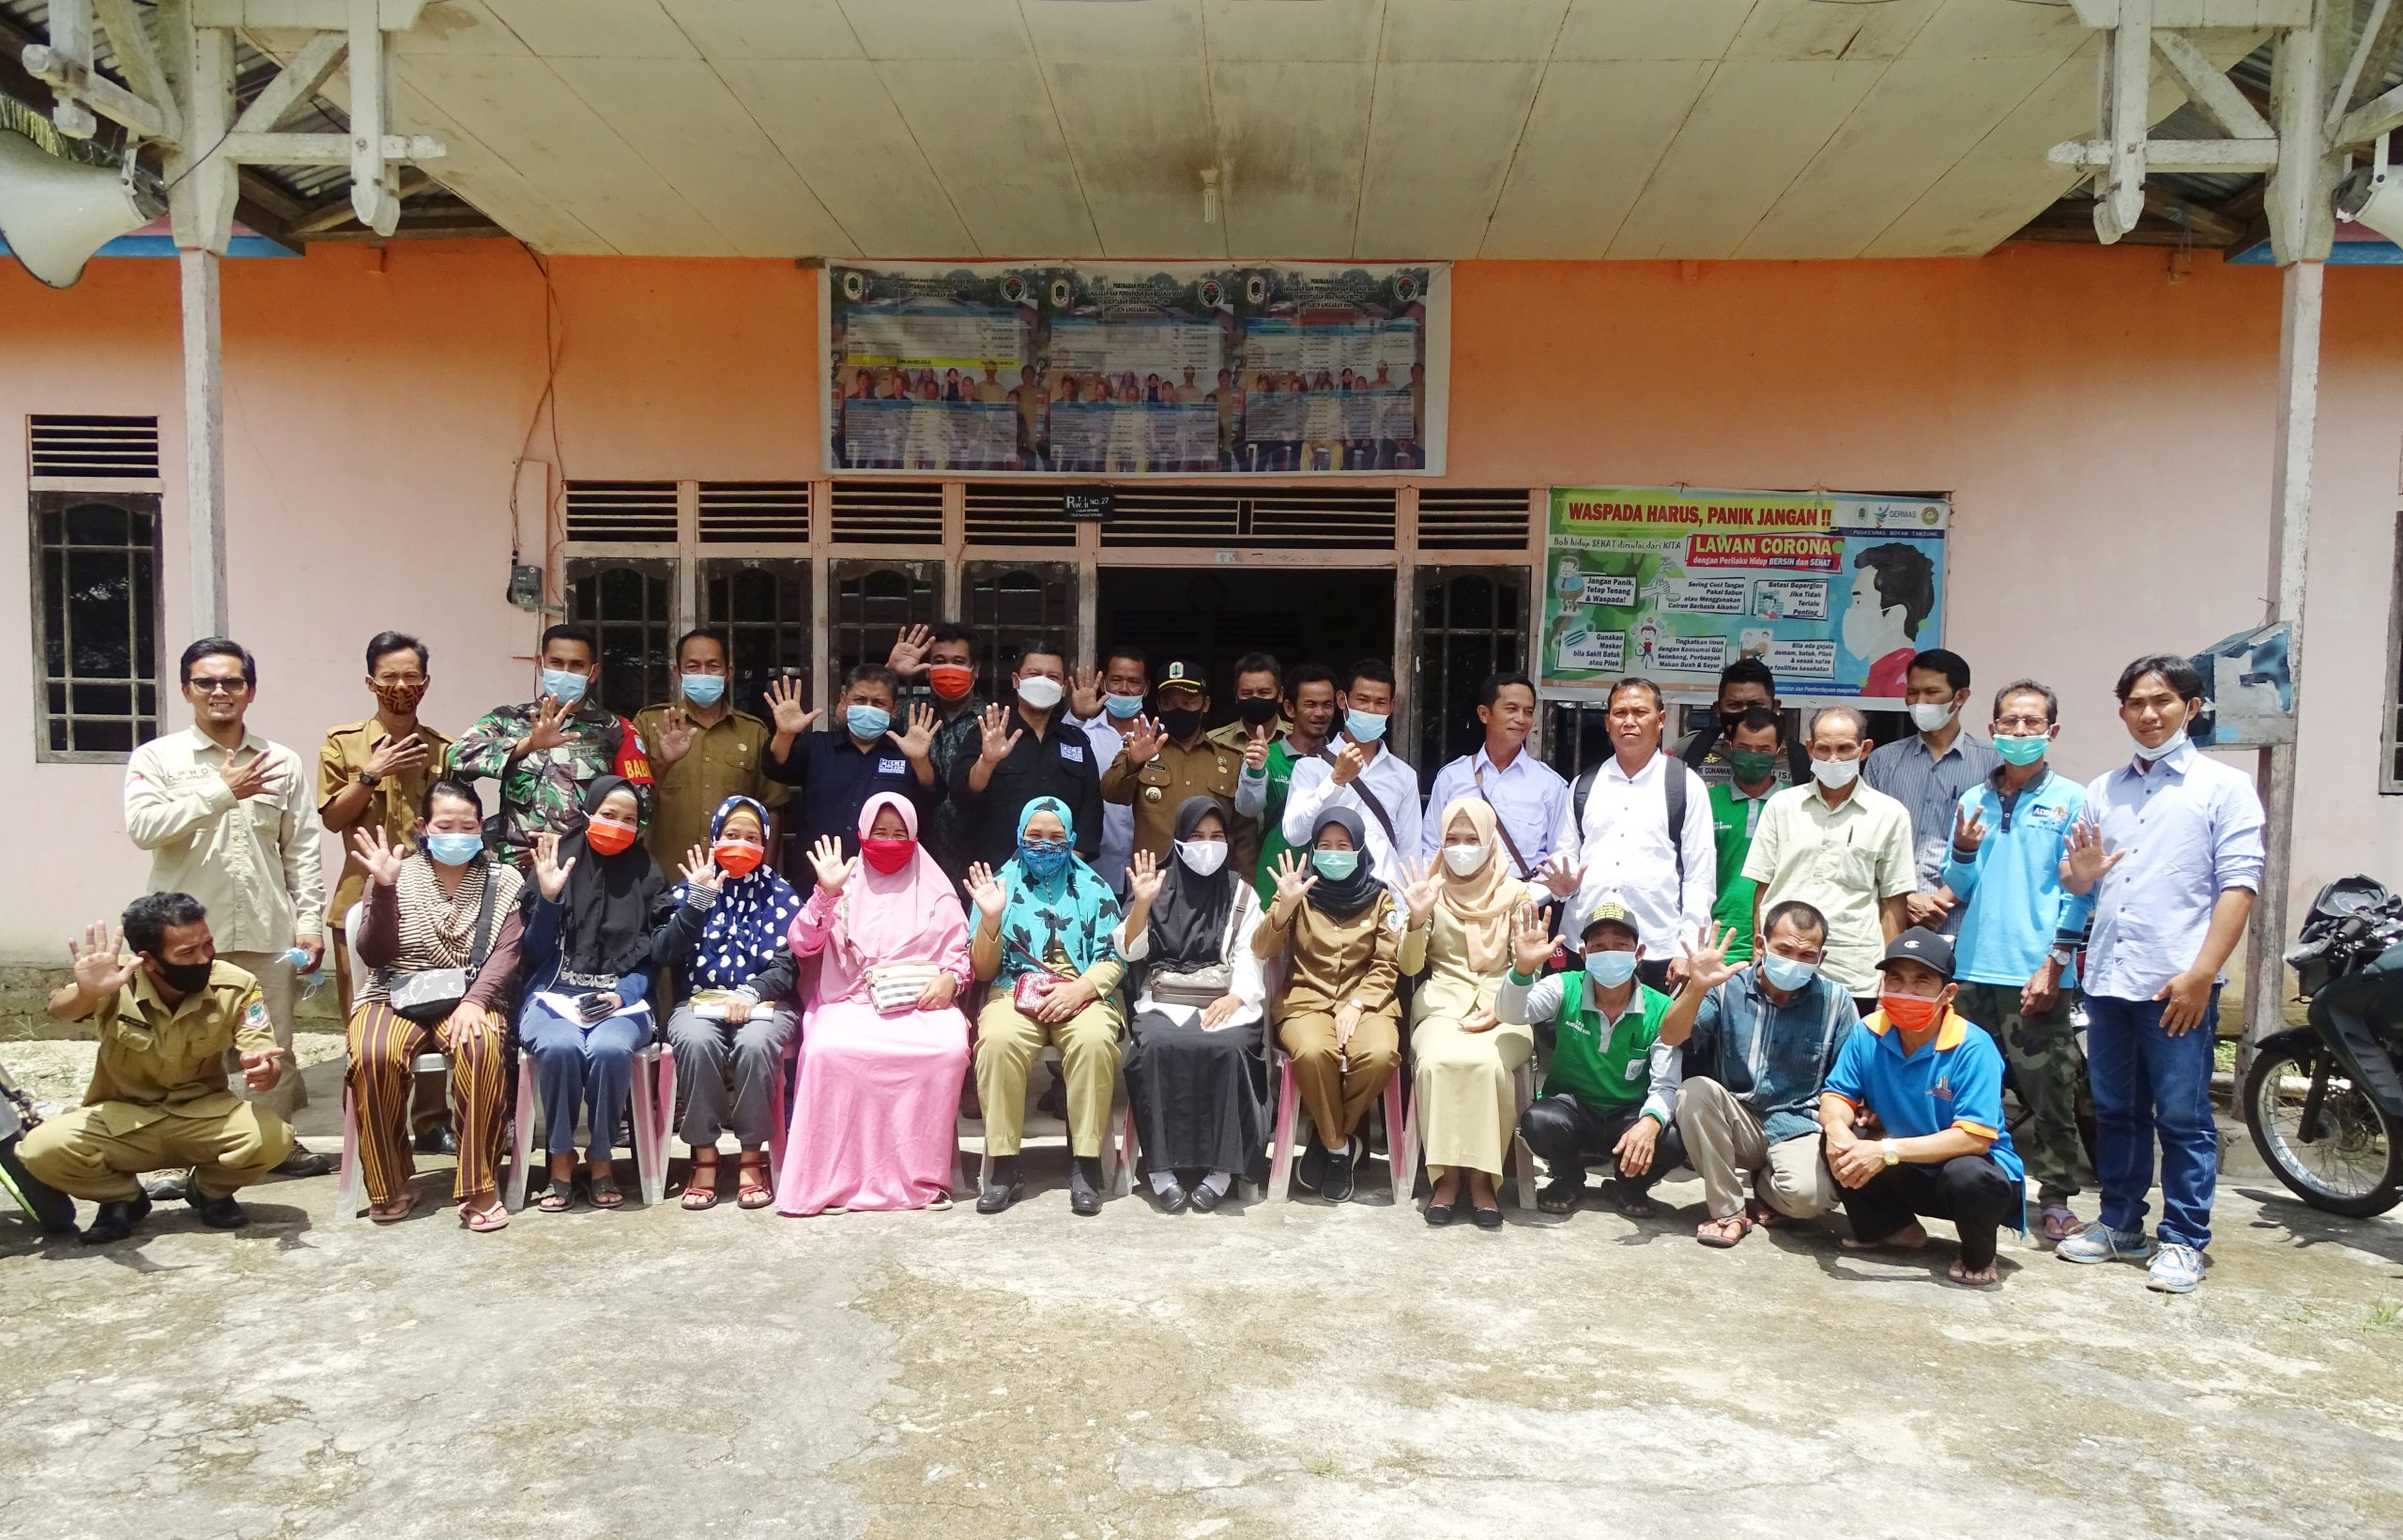 Tiga agenda besar yang akan dijalankan di desa Nanga Betung